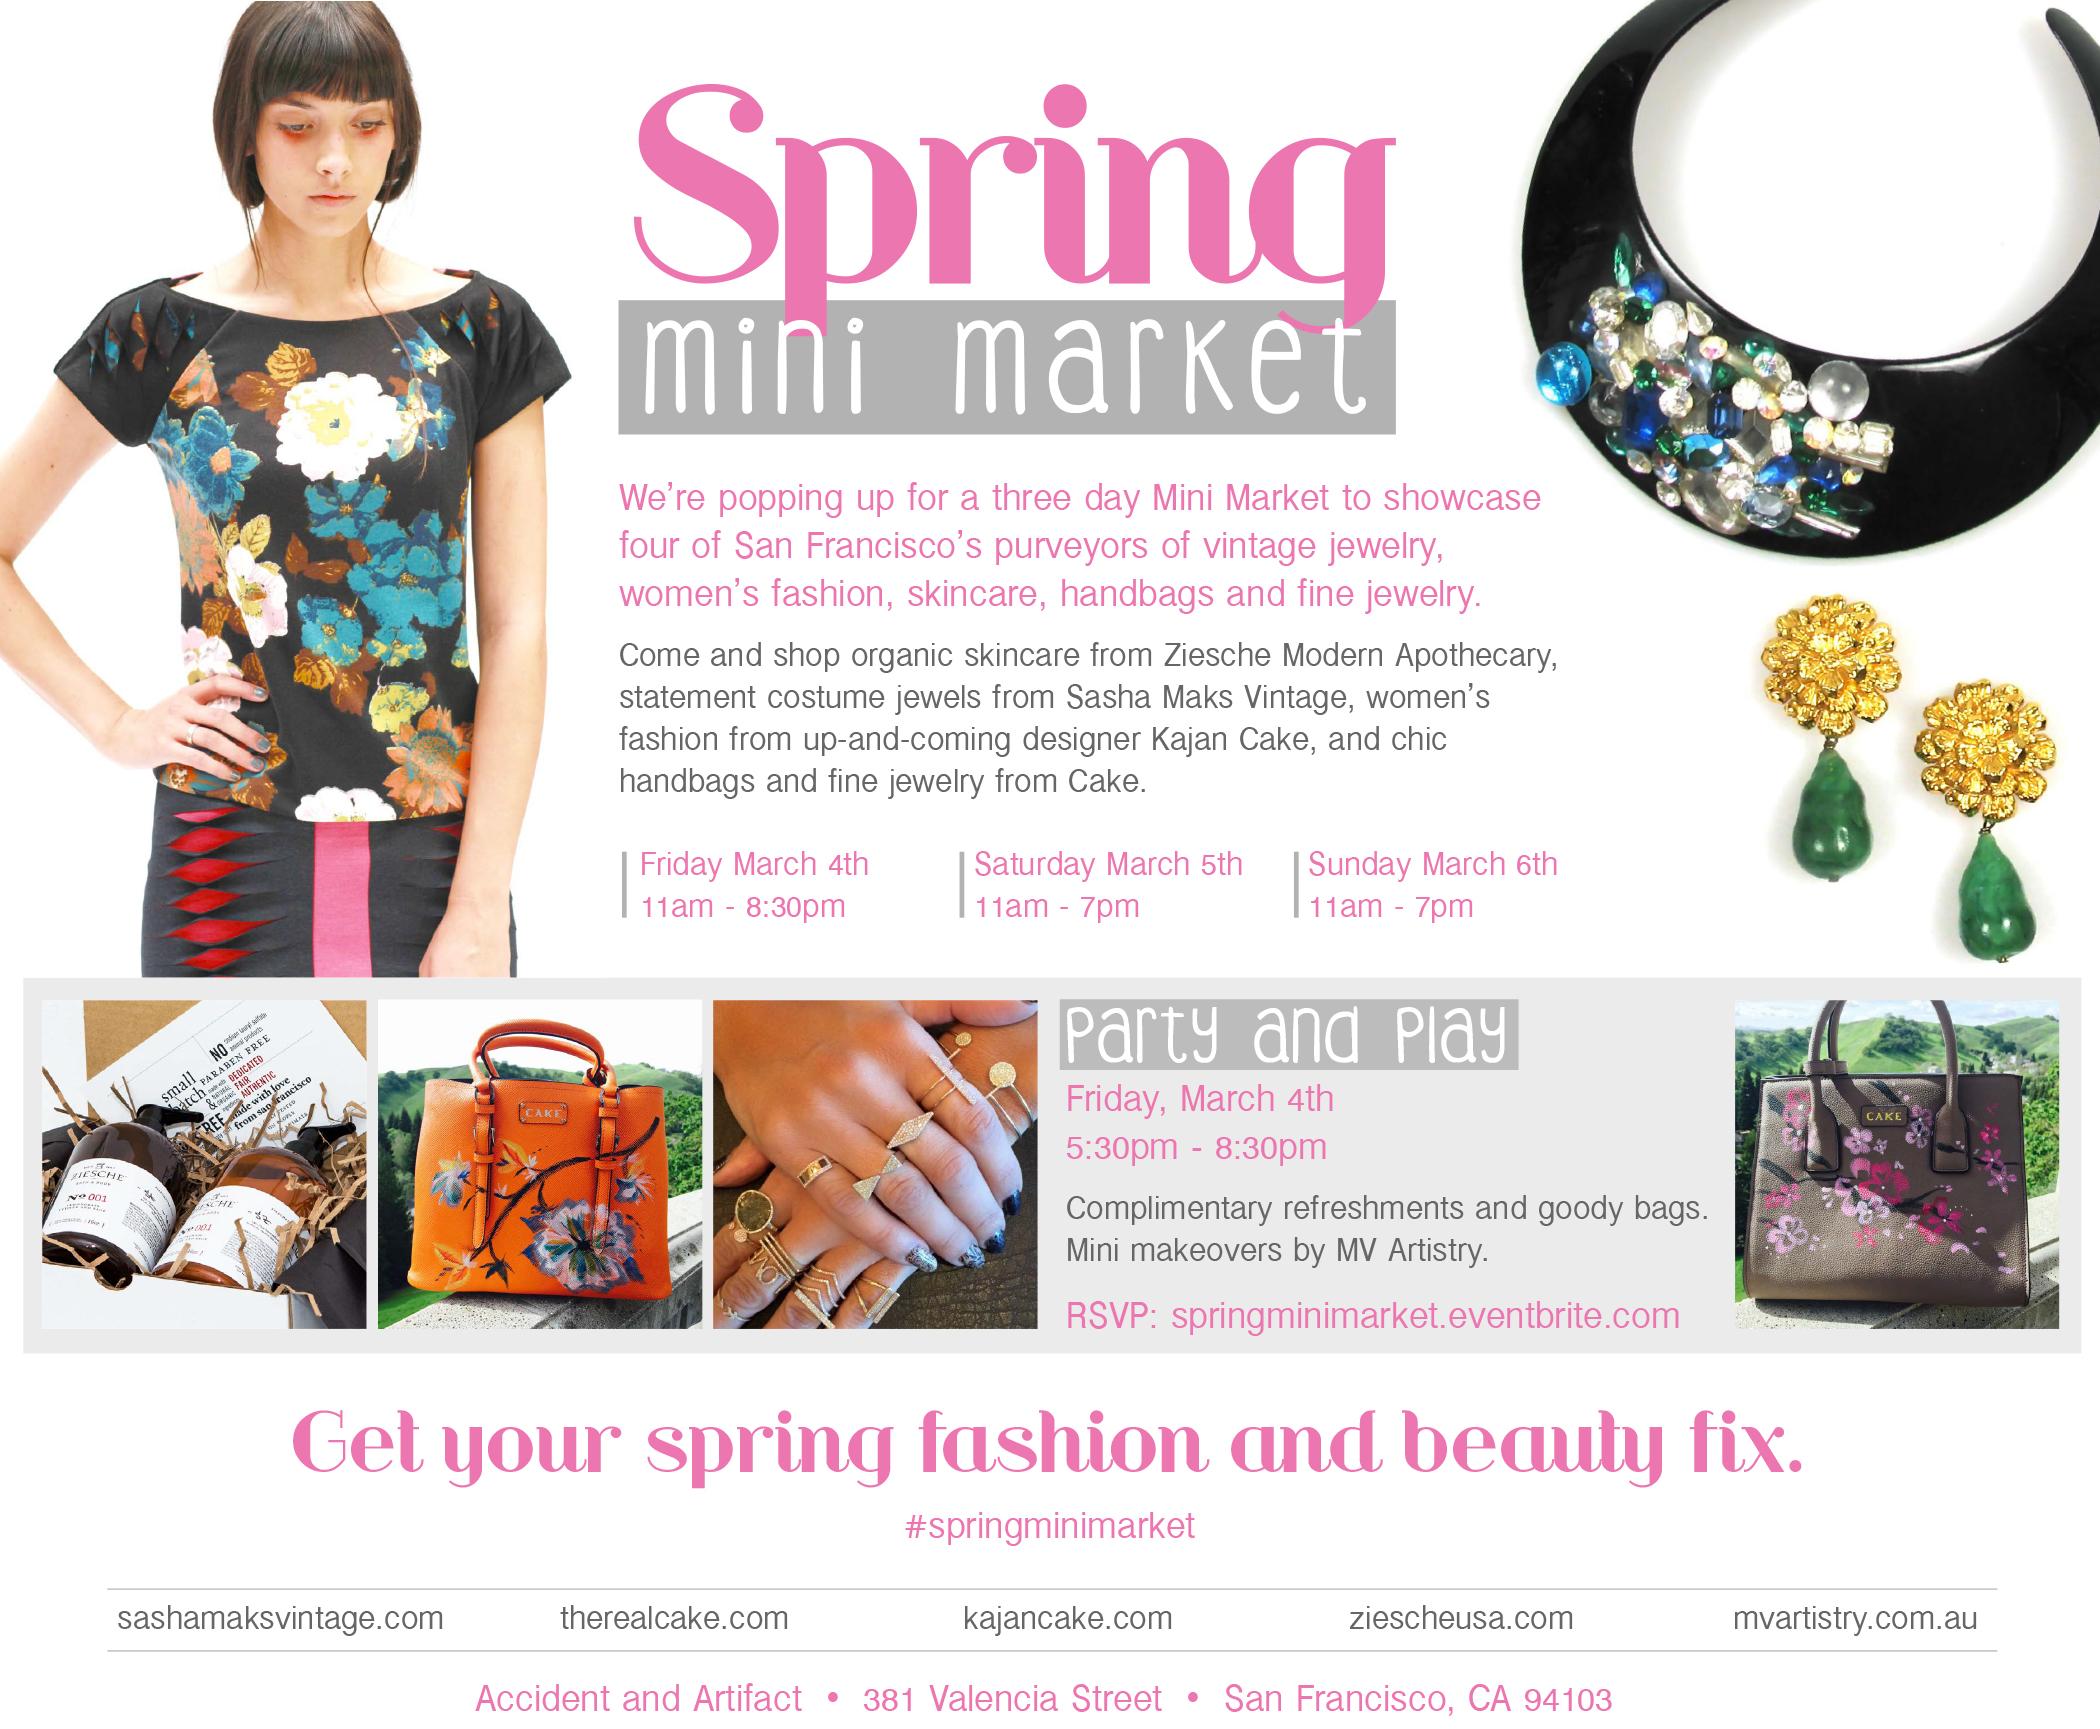 Spring Mini Market invite